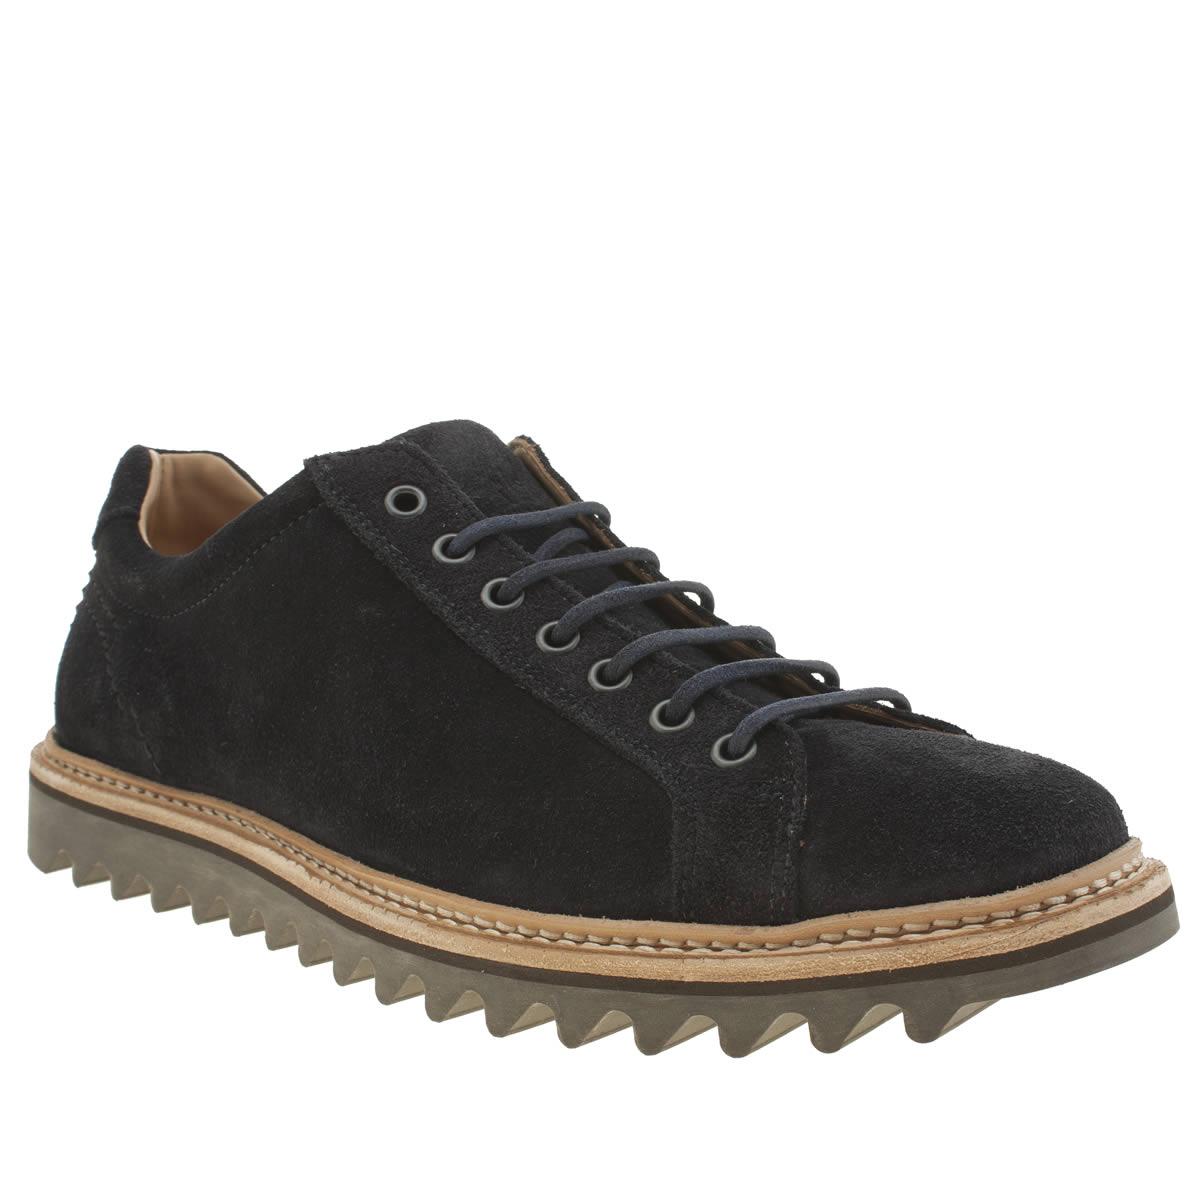 Northern Cobbler Northern Cobbler Navy Duskey Mens Shoes